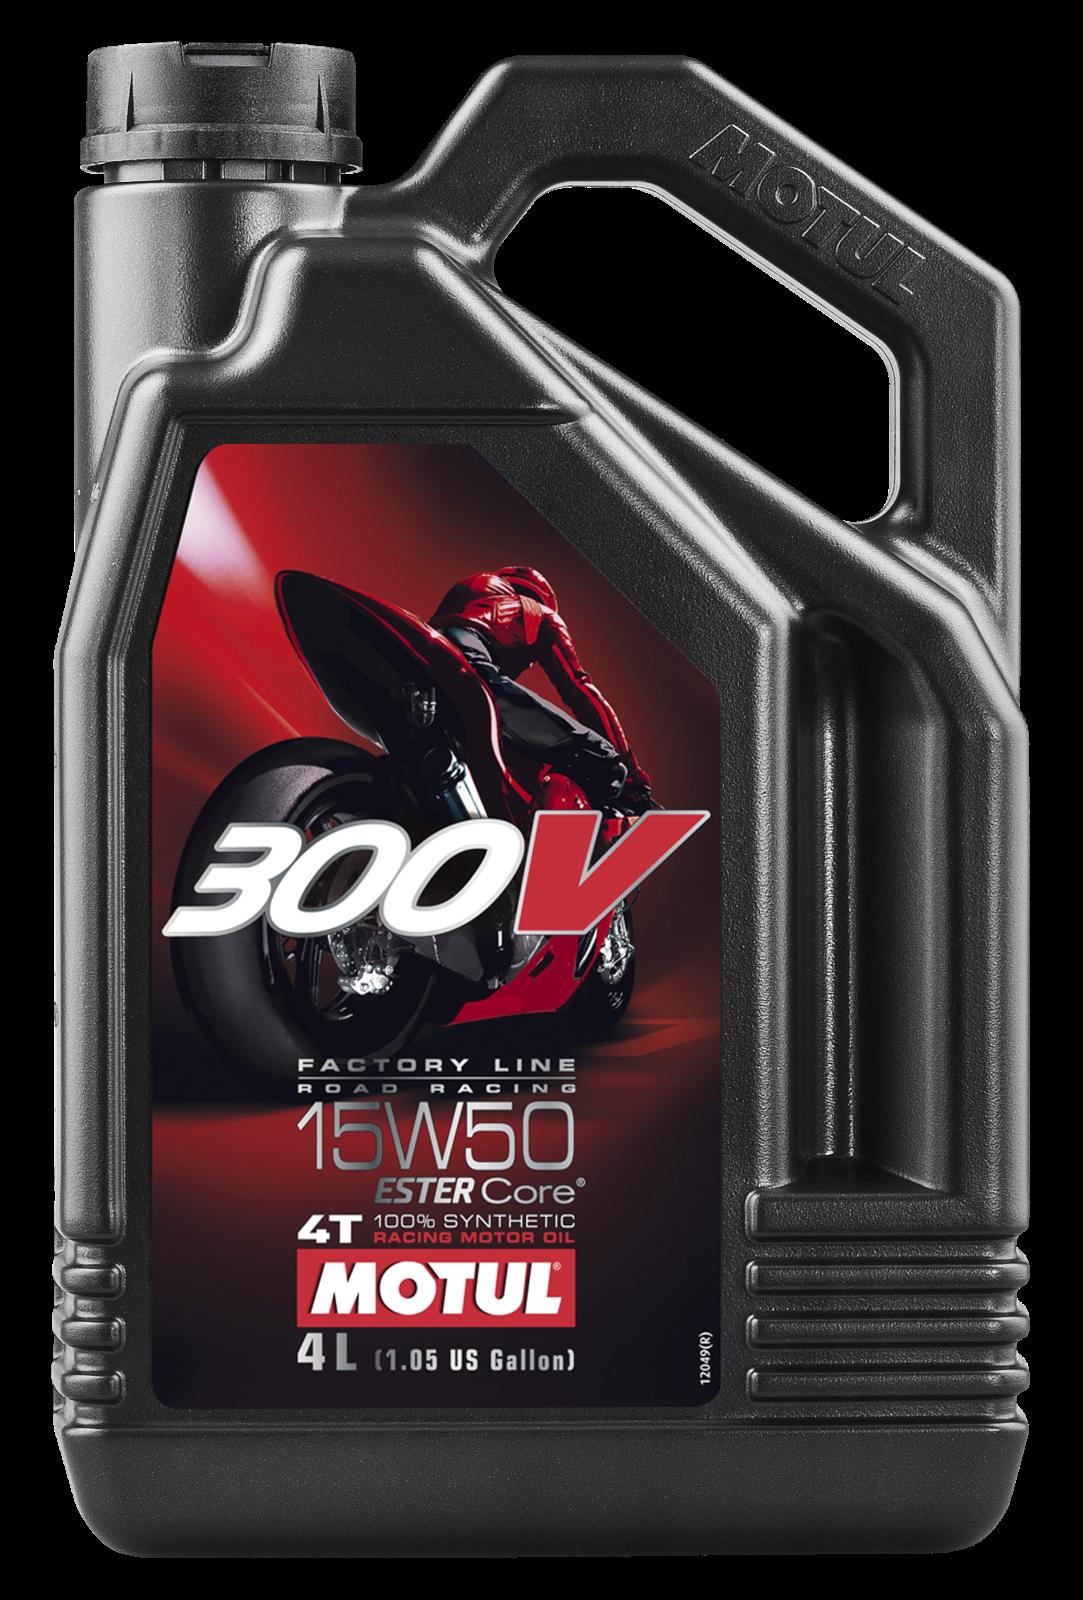 MOTUL AG MOTUL 300V 4T FACTORY LINE 15W-50 4L